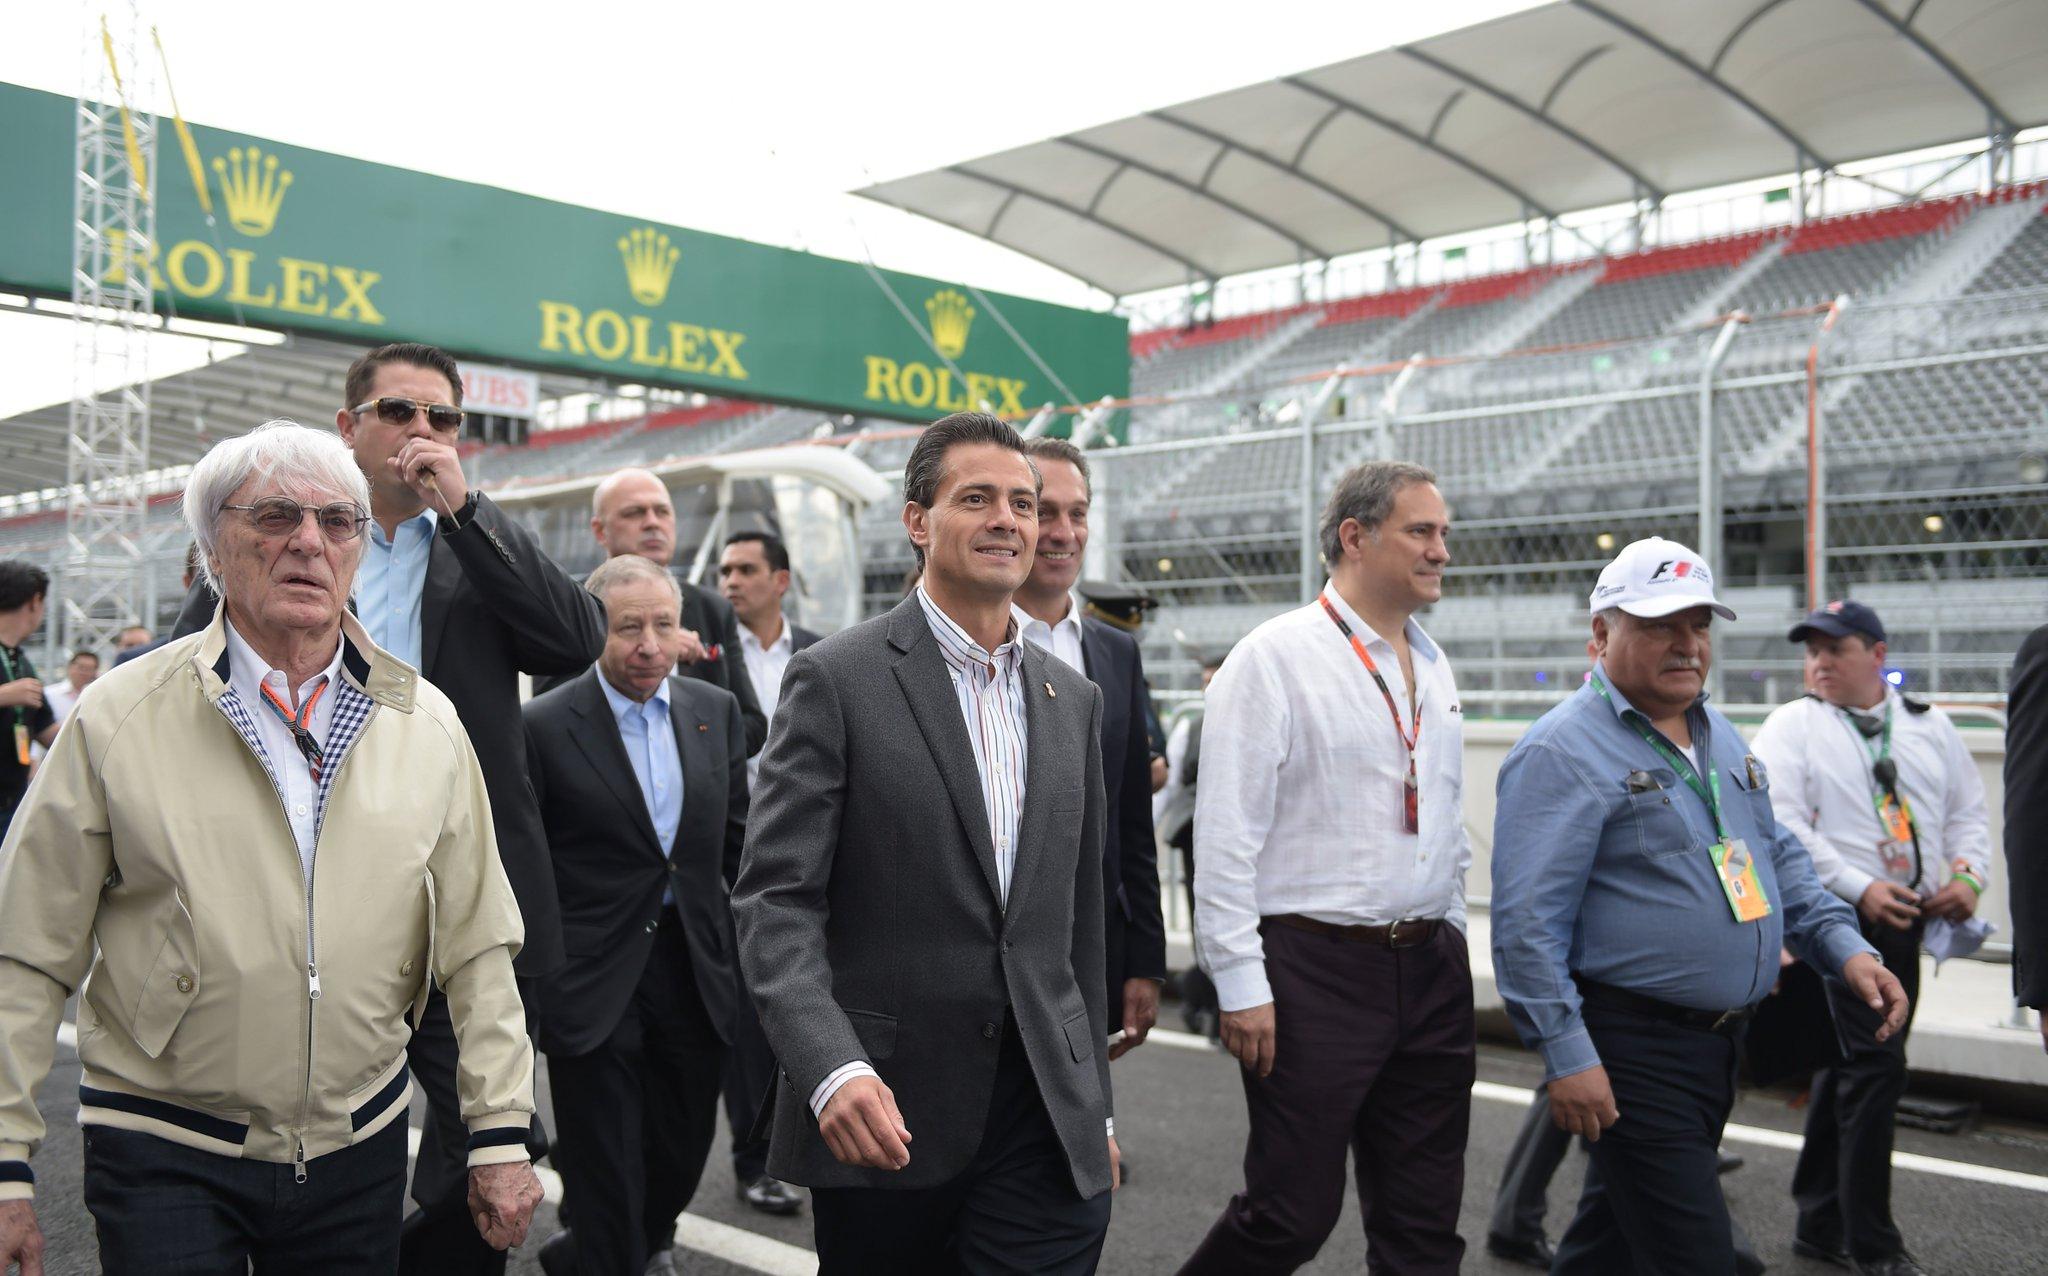 Recorrí el Autódromo Hermanos Rodríguez. Todo está listo para el Gran Premio de México #F1MX https://t.co/FMMXBQ49pz